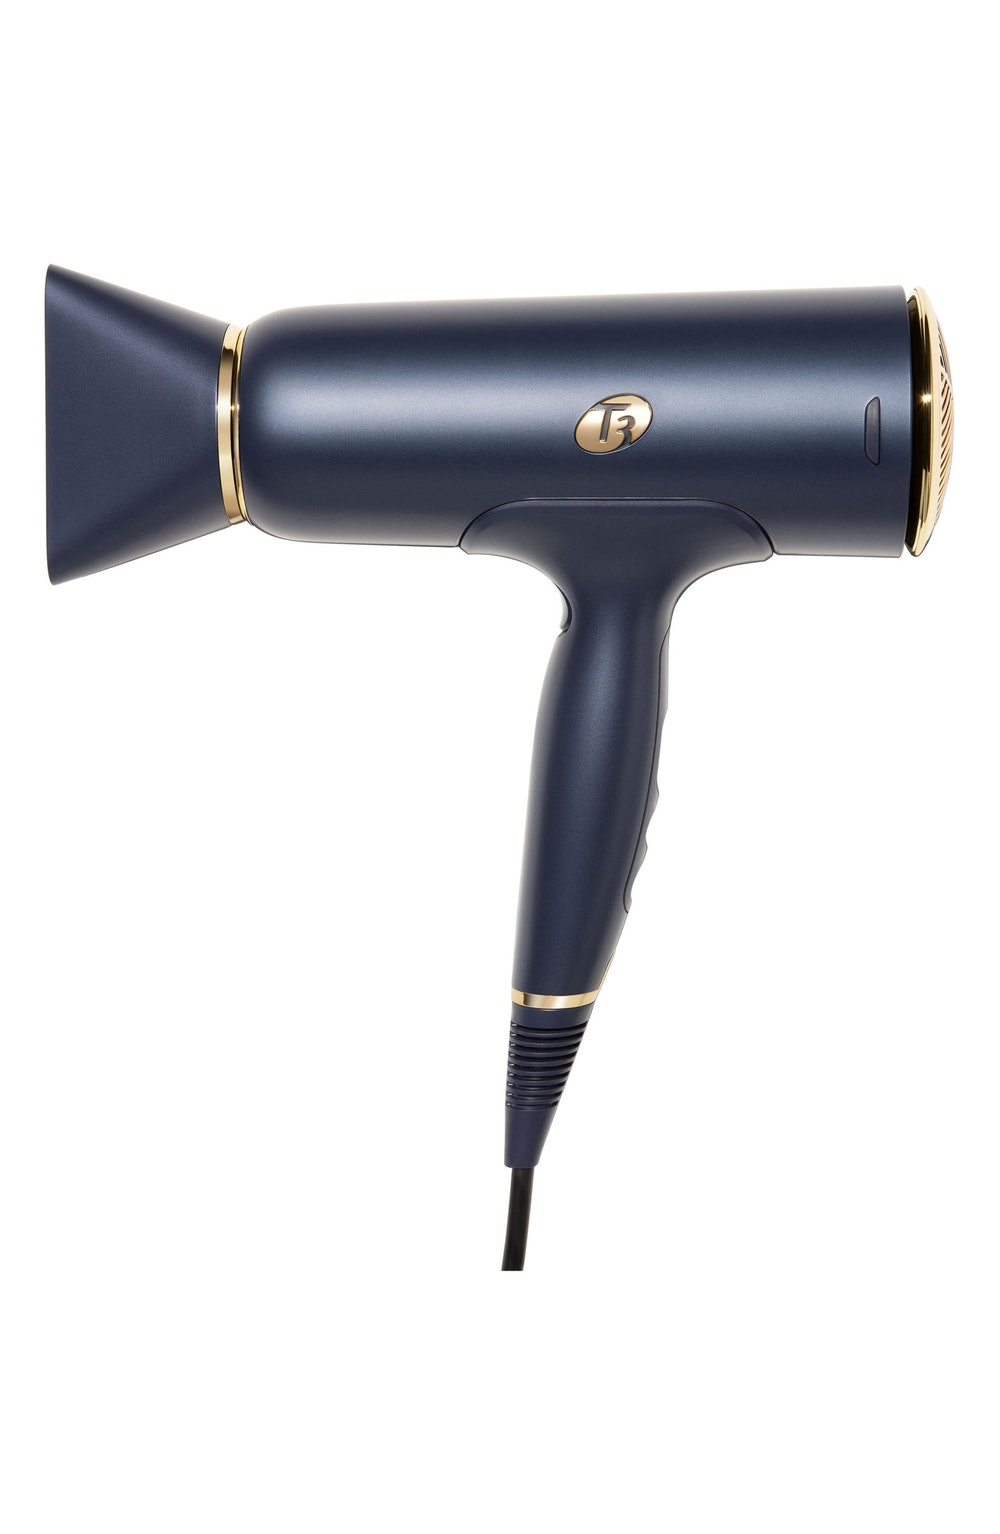 T3 Midnight Blue Cura Professional Digital Ionic Hair Dryer